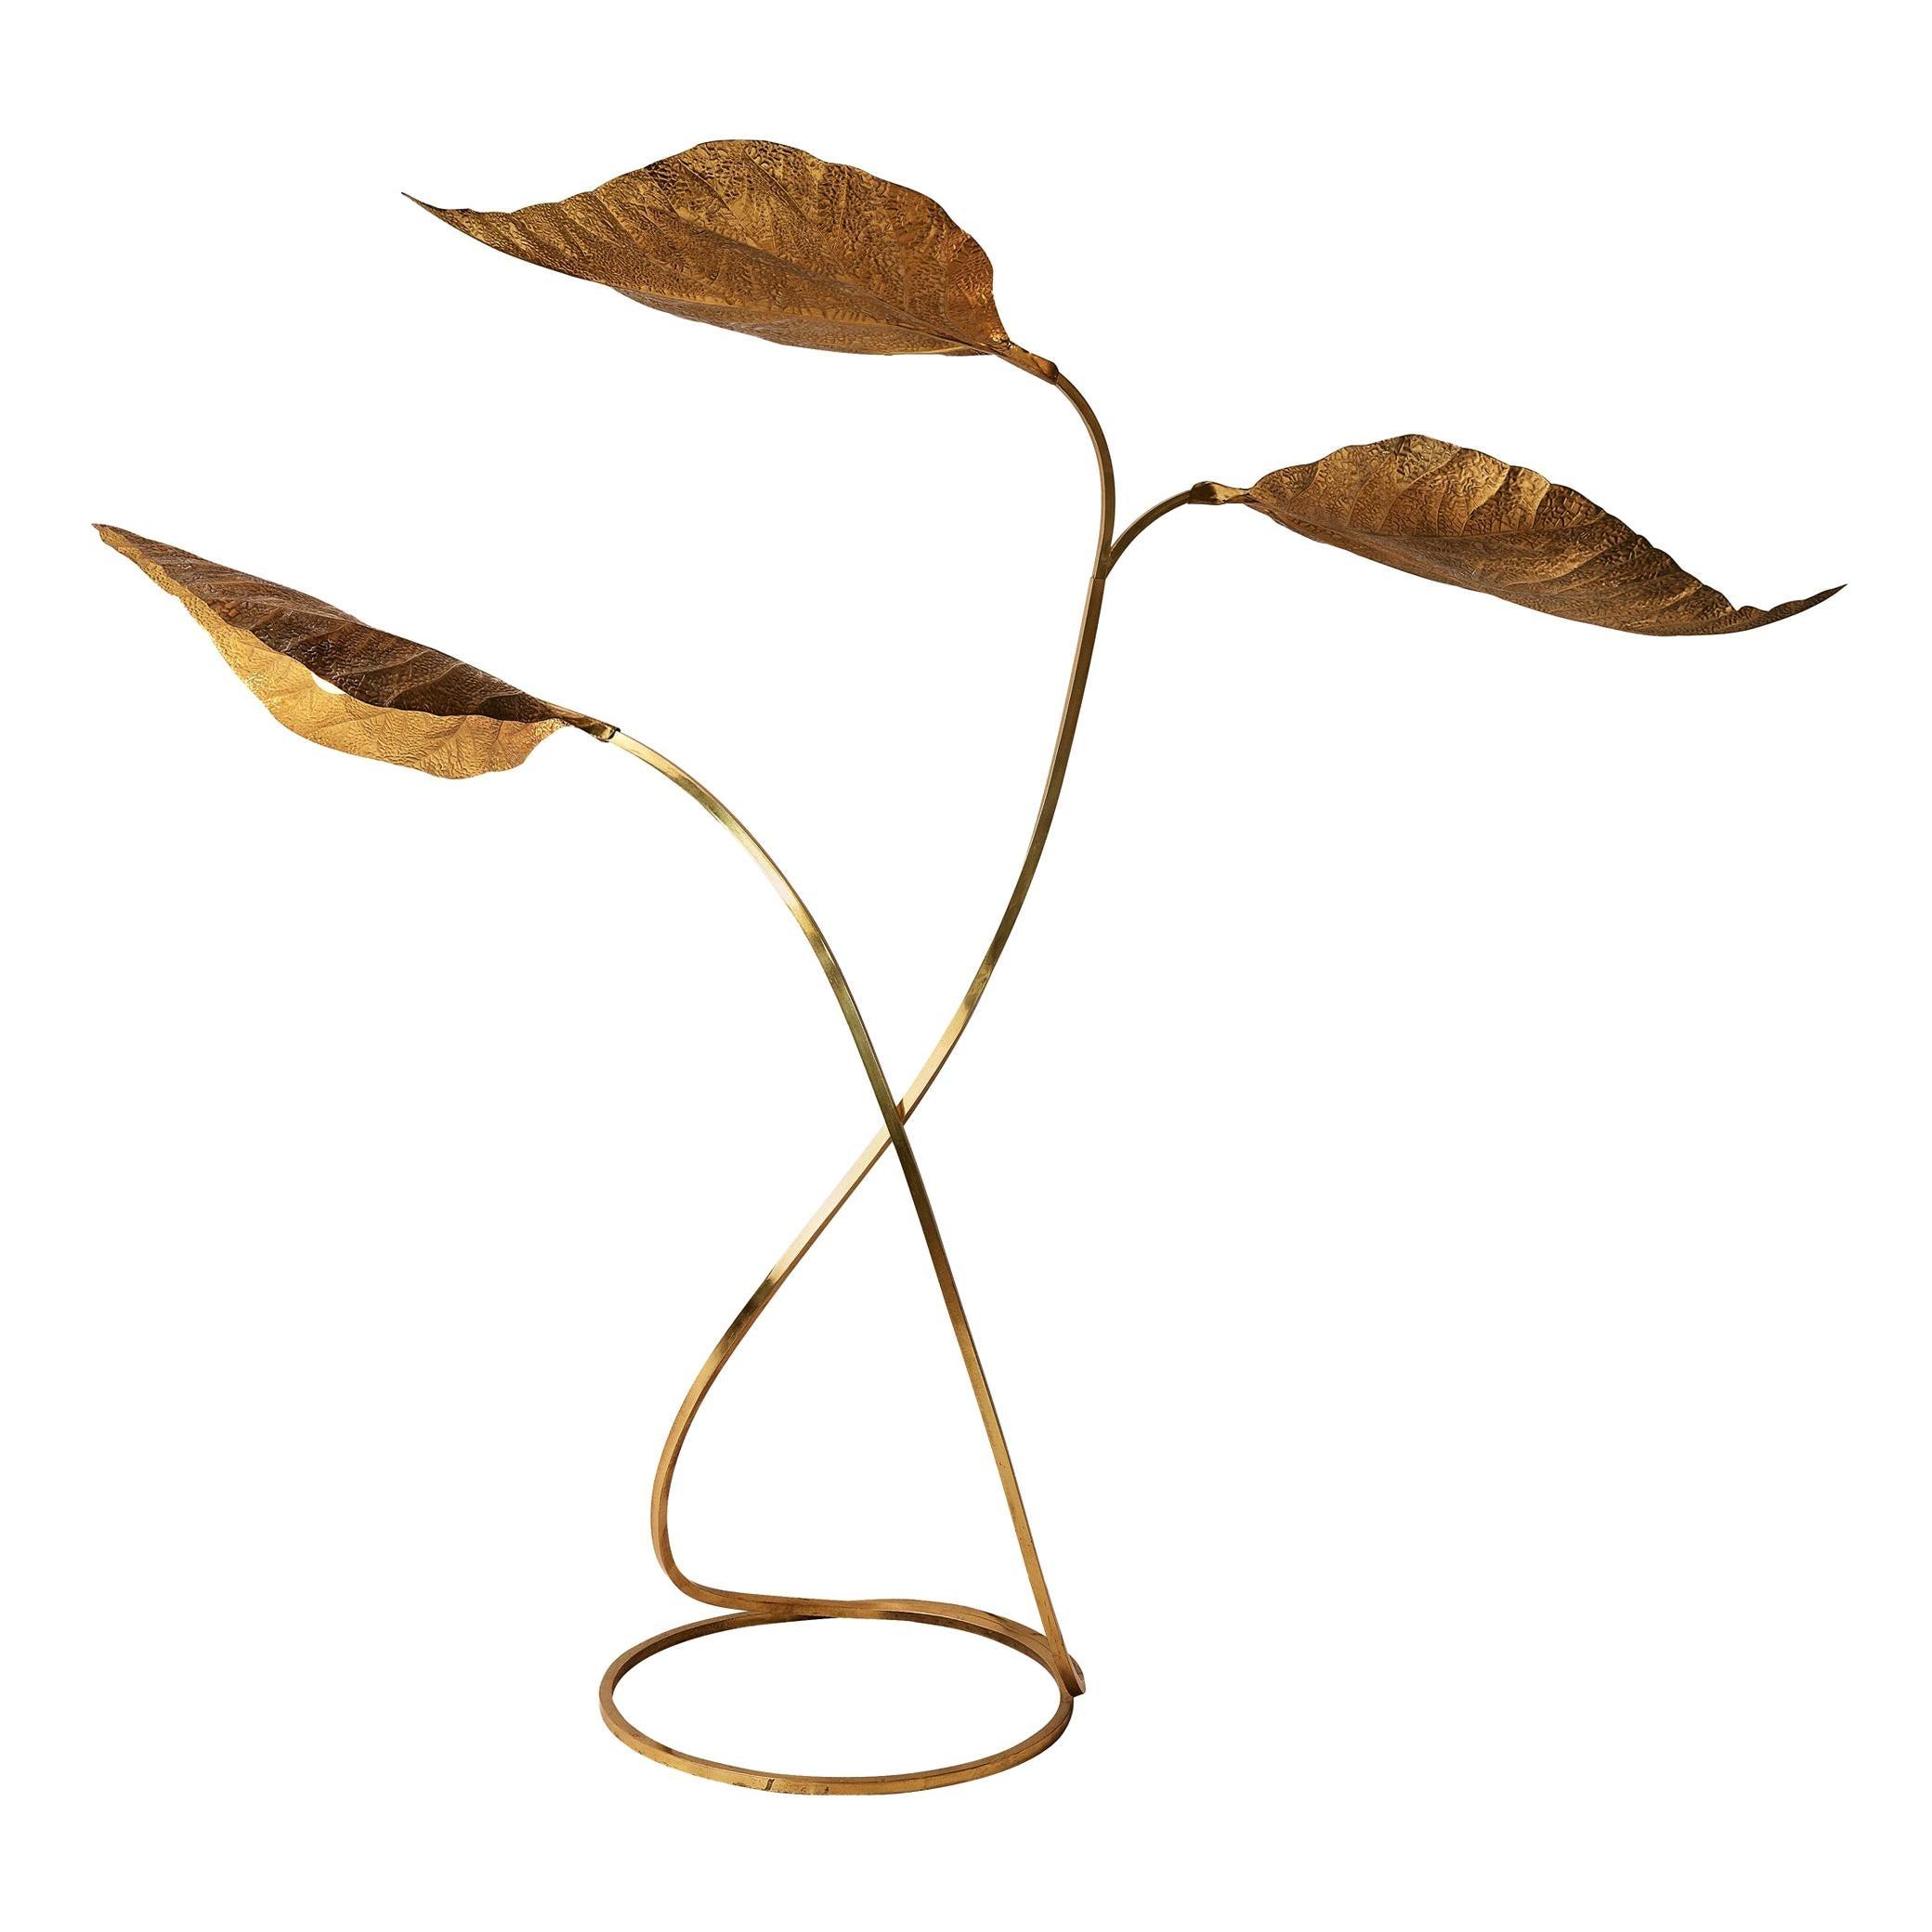 Tommaso Barbi Organic Leaf Floor Lamp in Brass